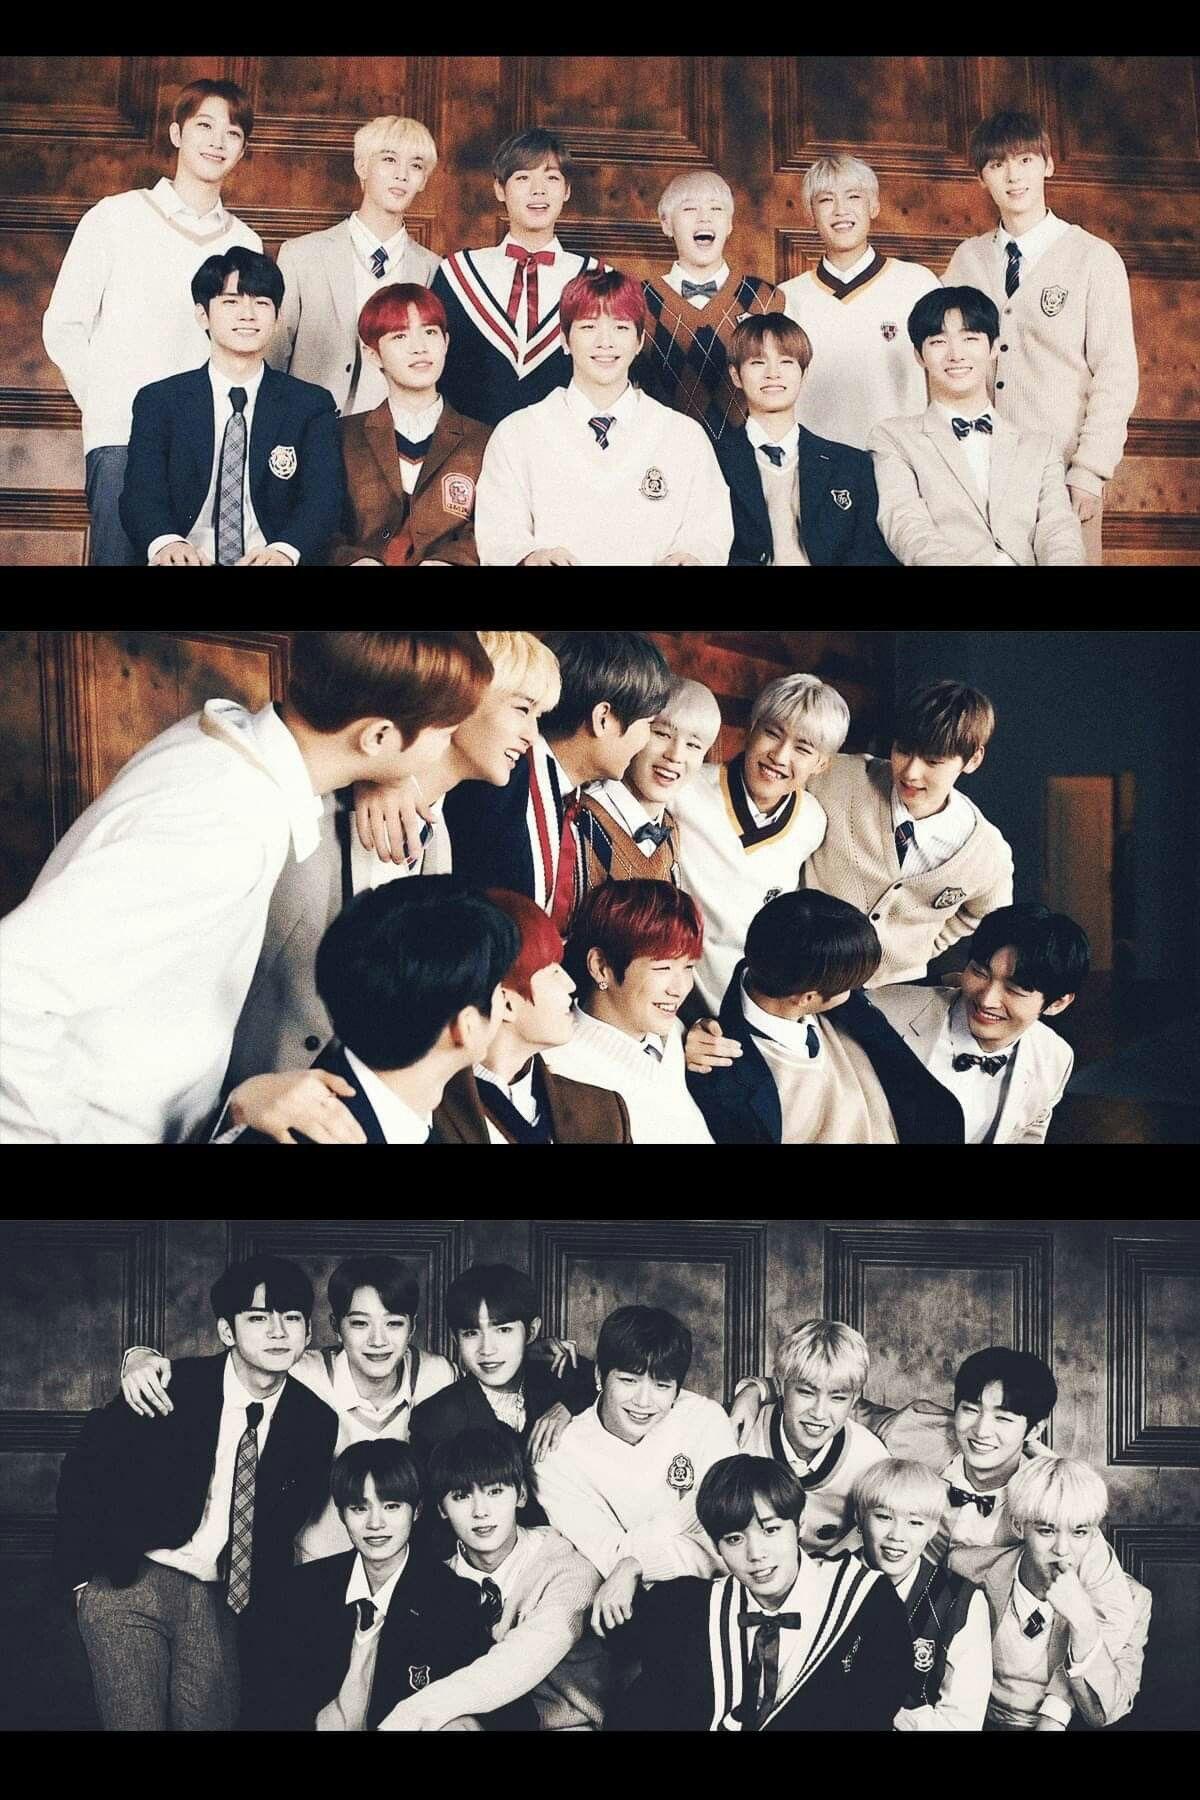 I Didnt Prepare Myself For Wanna One S Disbandment Its So Painfulll I Dont Want The Year 2018 To End T 0t Kenangan Gambar Dan Selebritas